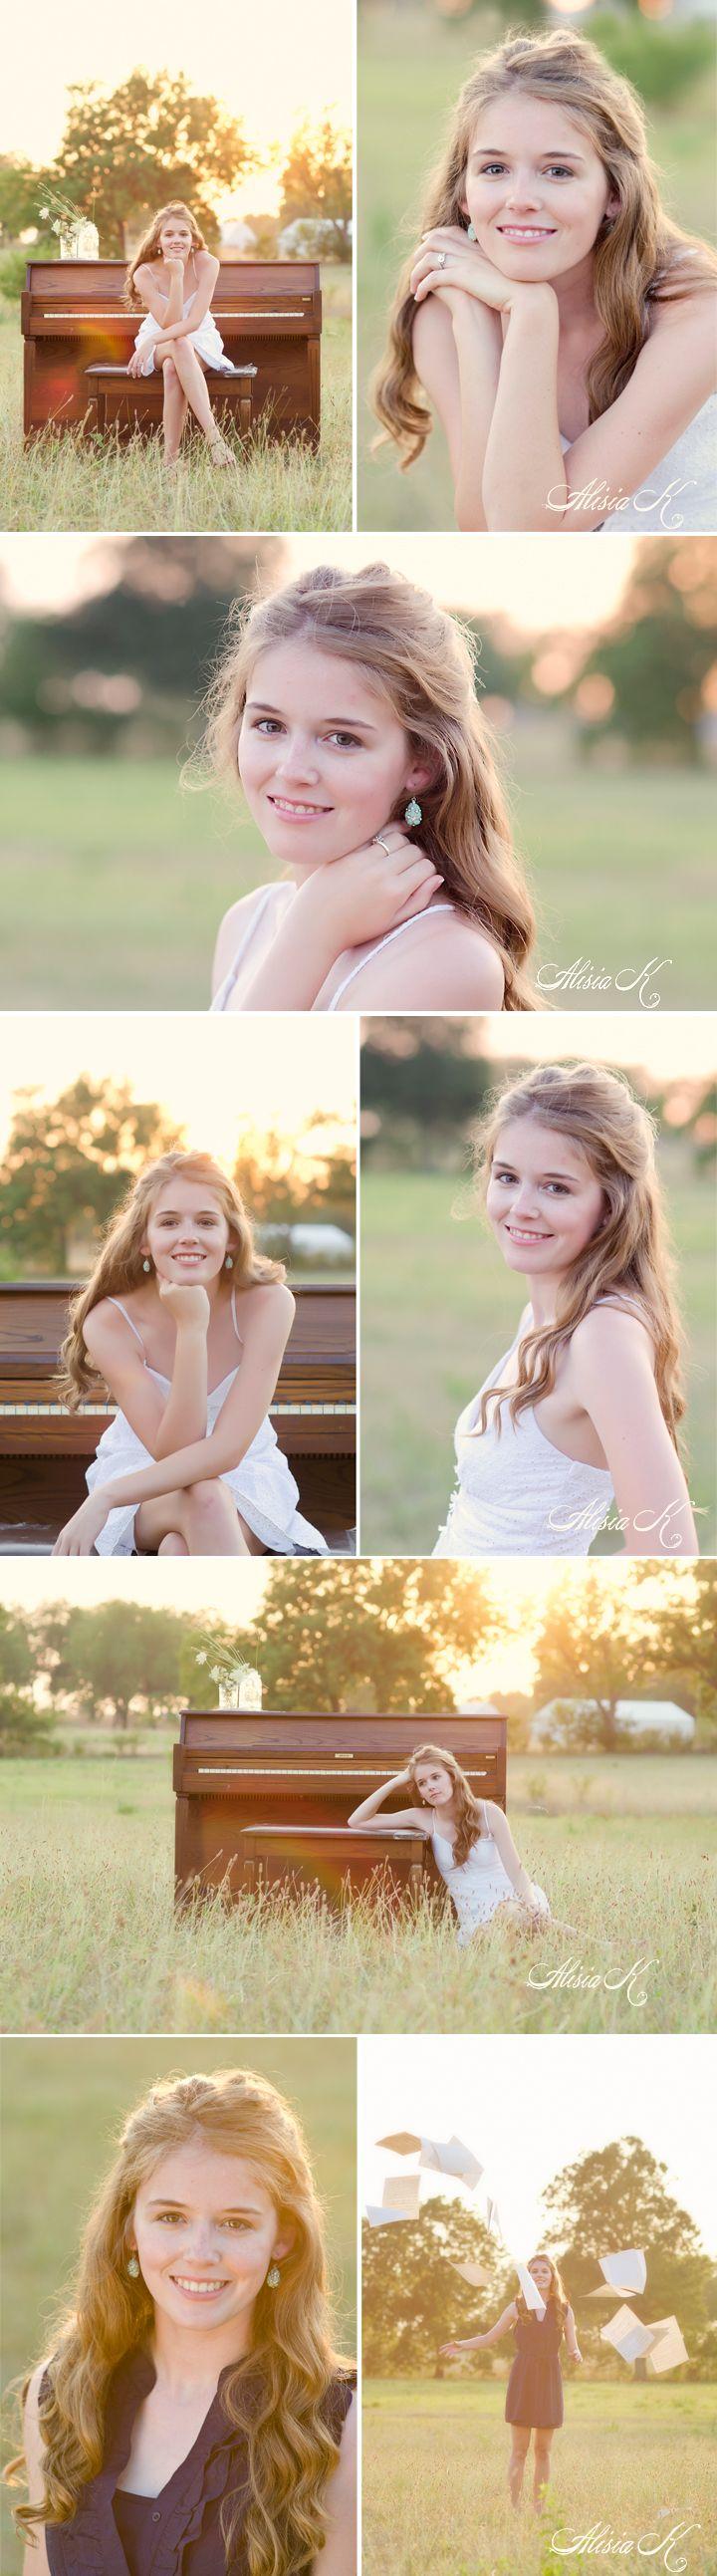 Alisia K Photographer  Senior Photographer  Springfield, Missouri  www.alisiak.com  #seniorportraits #seniorpictures